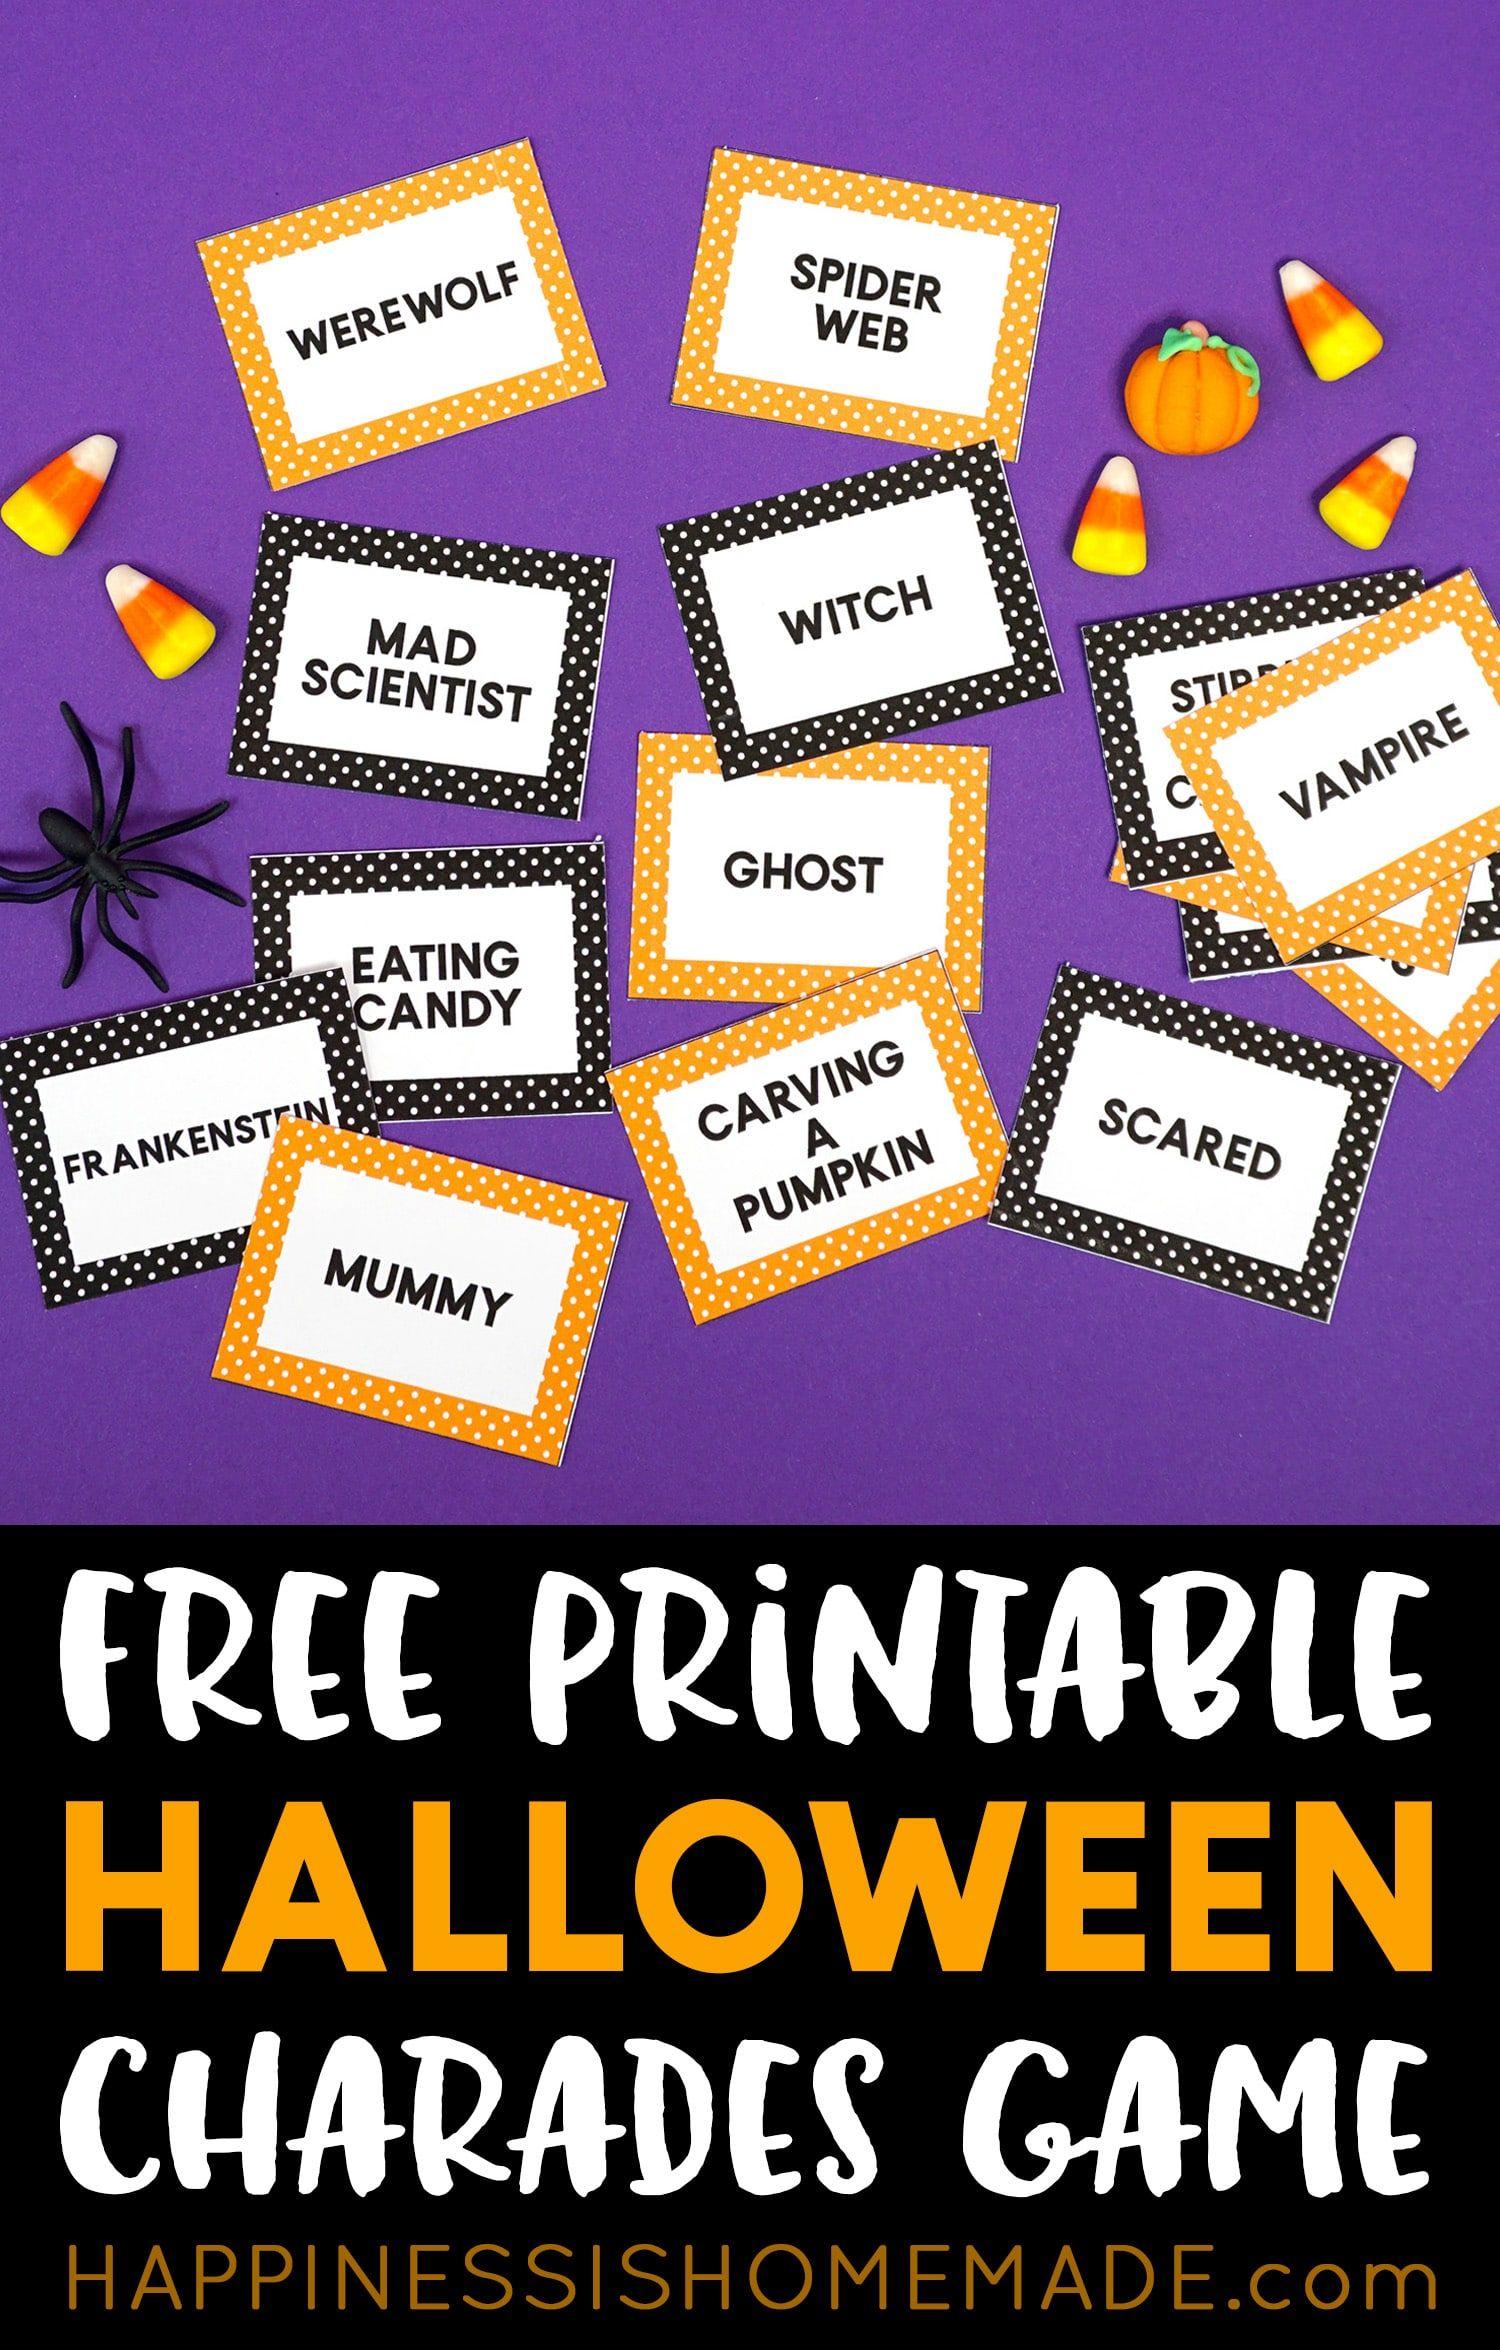 Free Halloween Charades Game Printable This Halloween